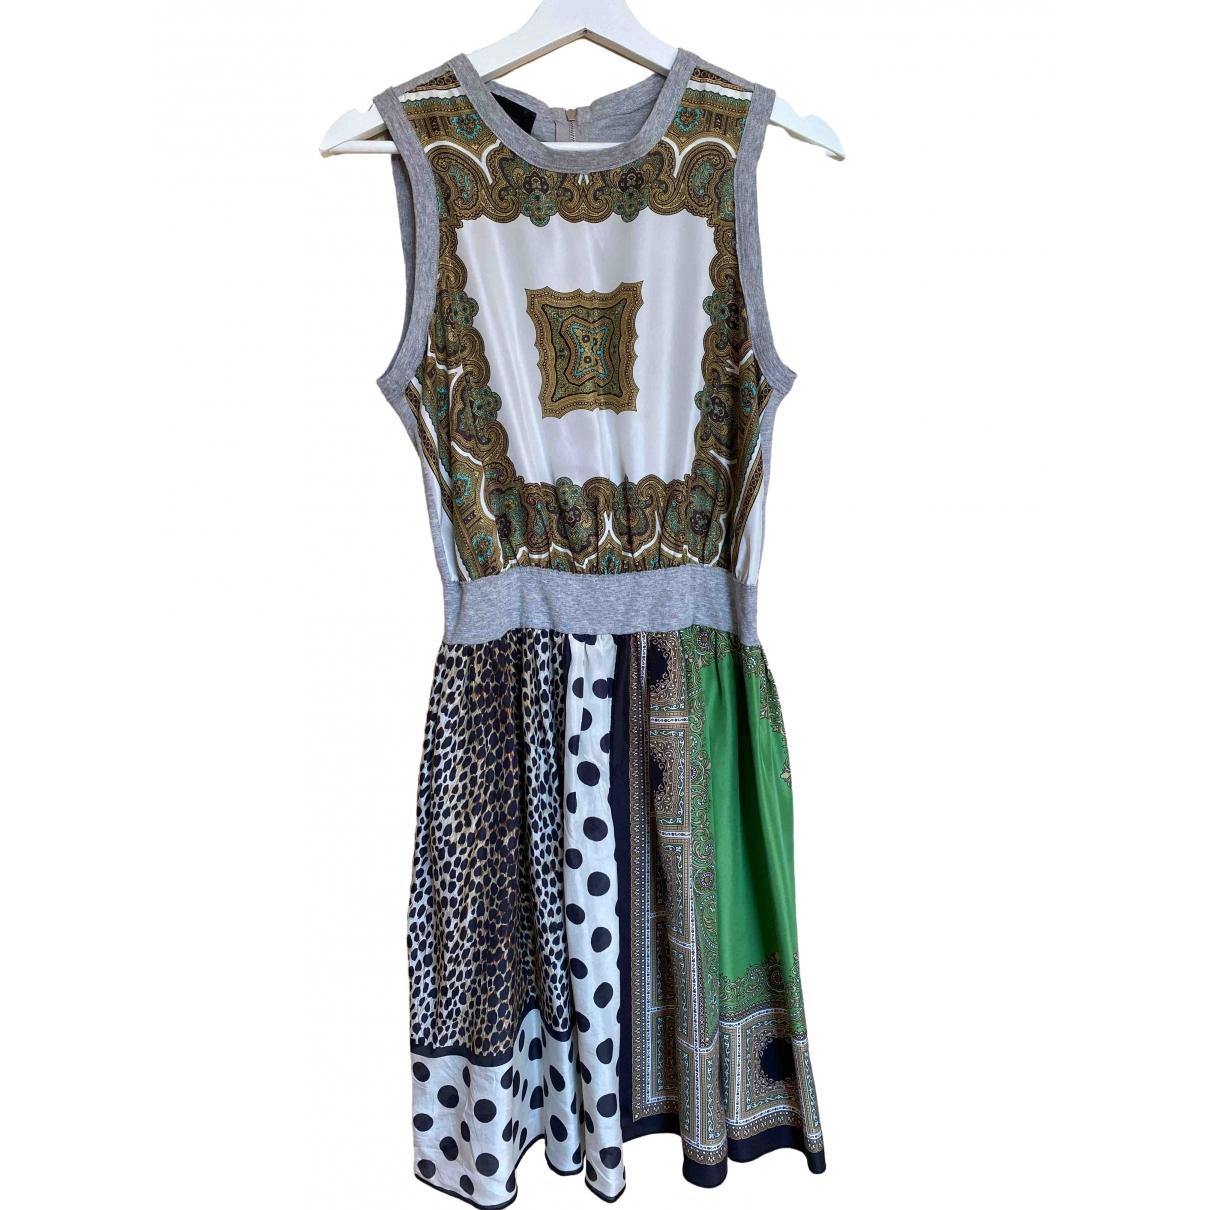 D&g \N Silk dress for Women 40 IT